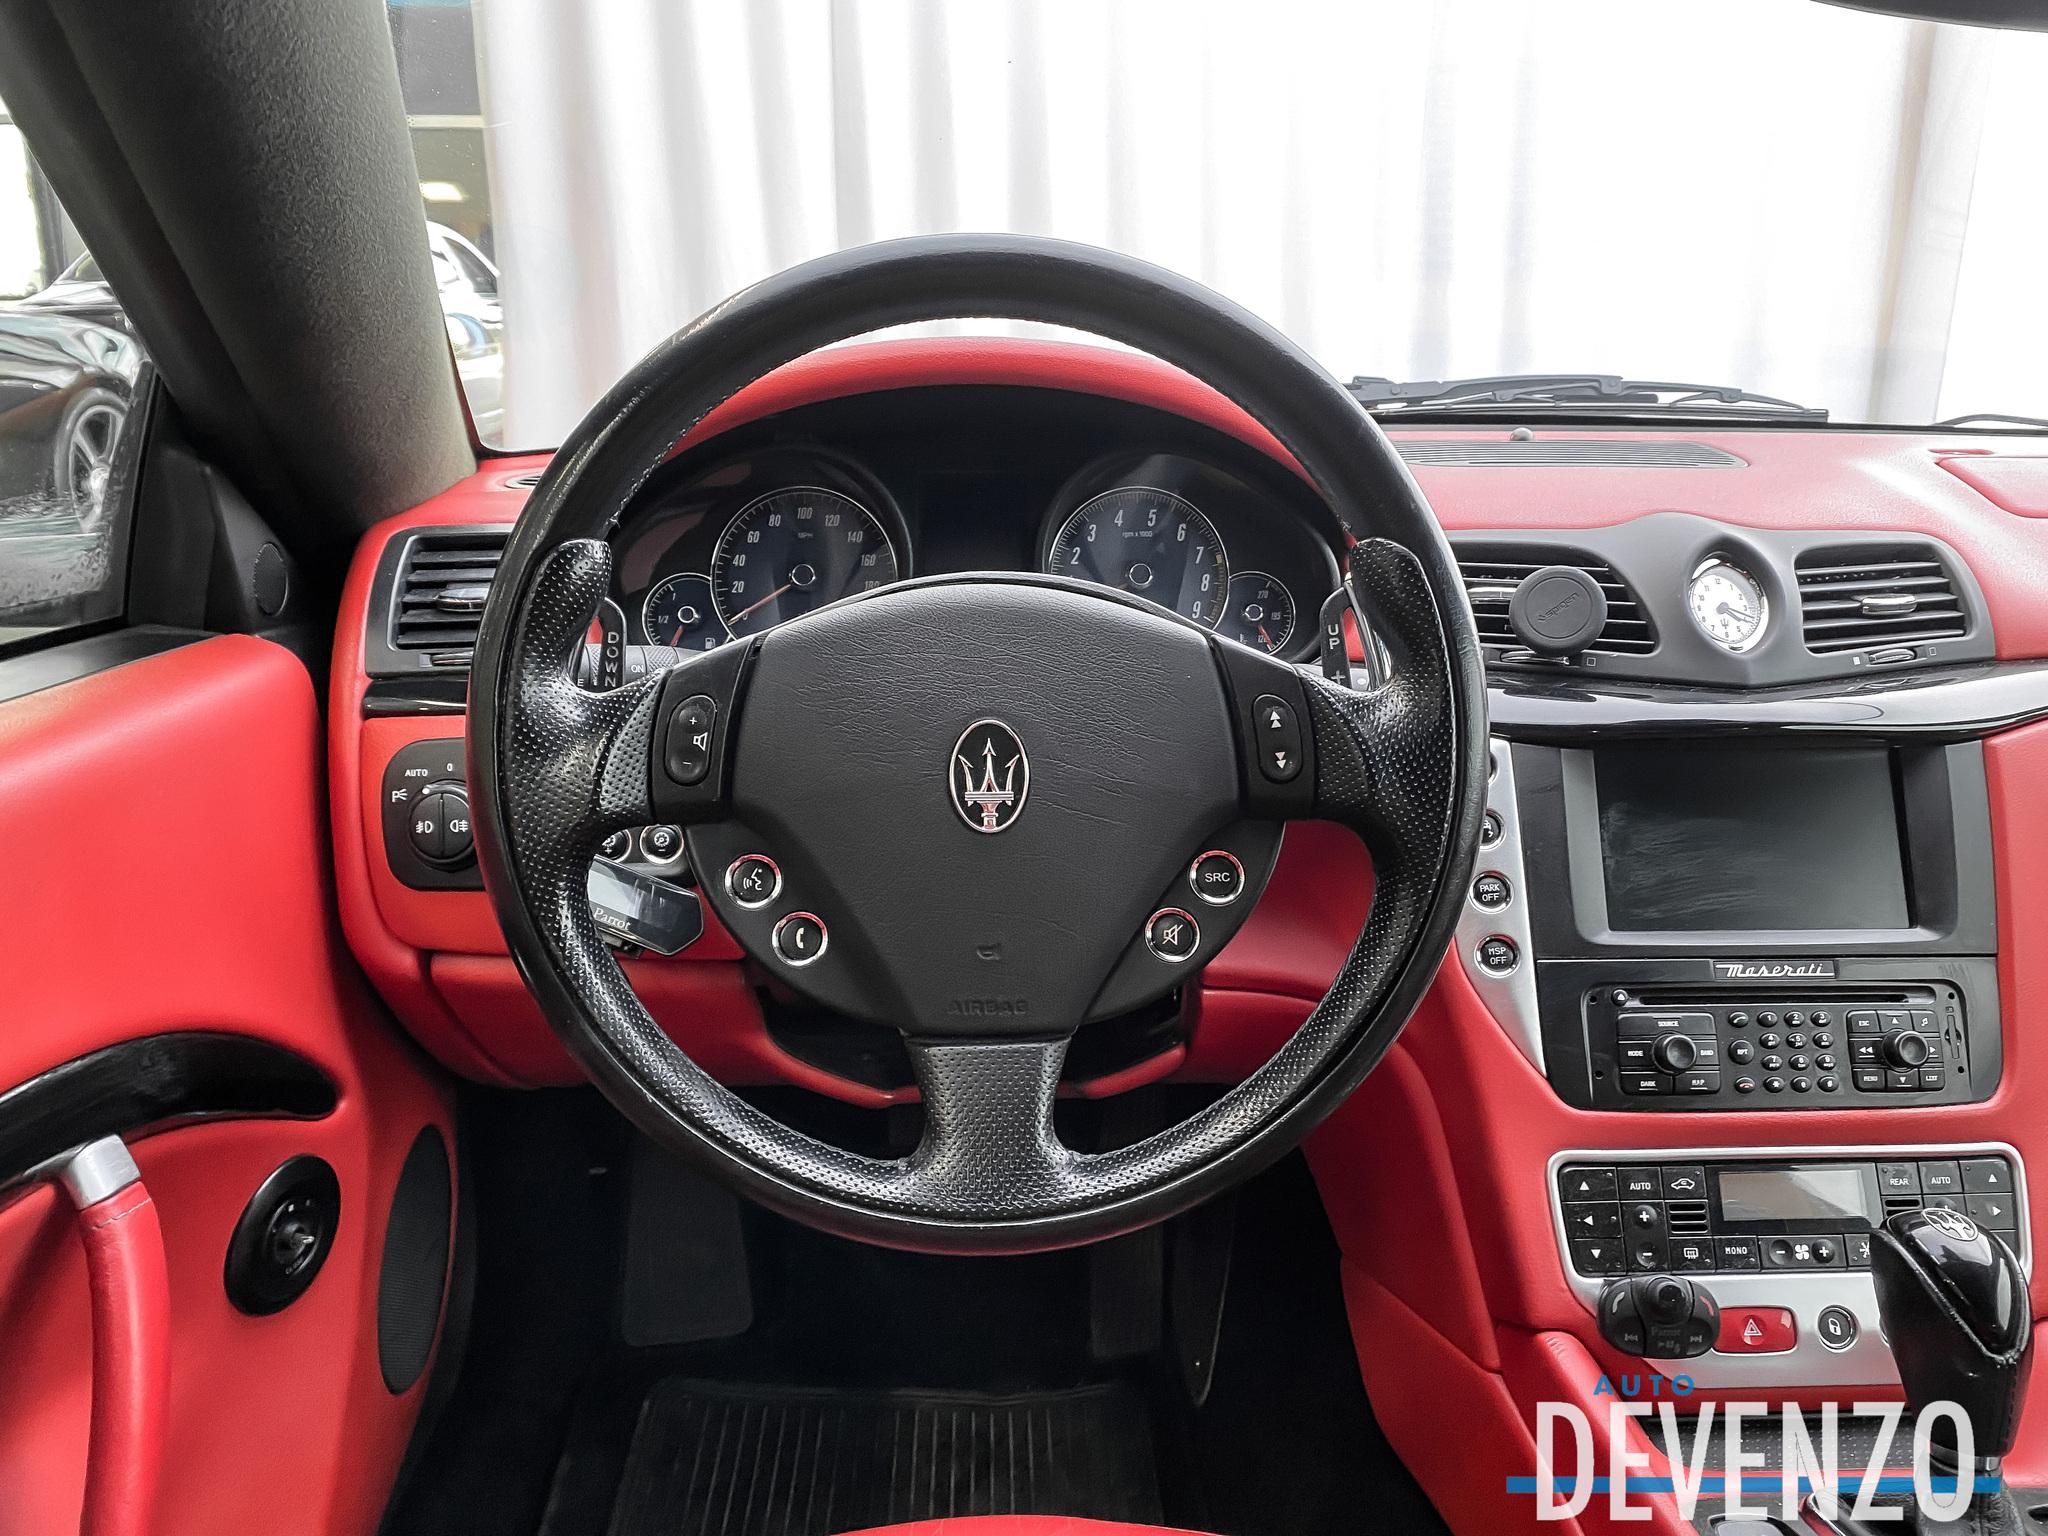 2008 Maserati GranTurismo 4.2L V8 COUPE BAS KILOMETRAGE complet